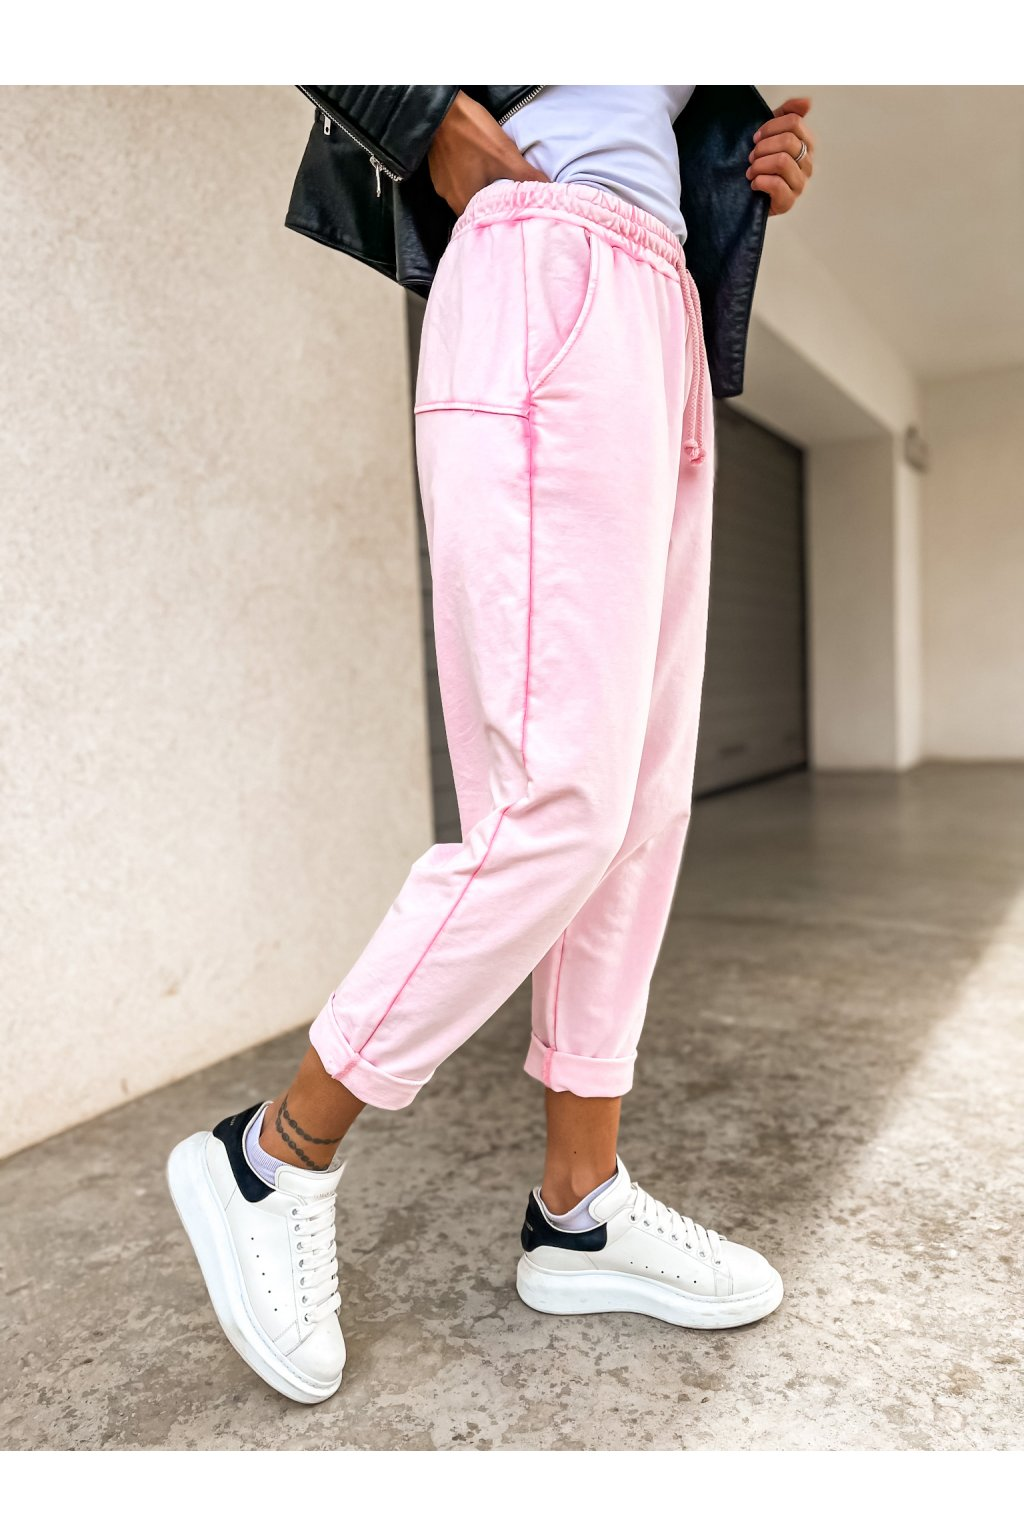 damske teplakove kalhoty dastin exlusive light pink eshopat cz 1